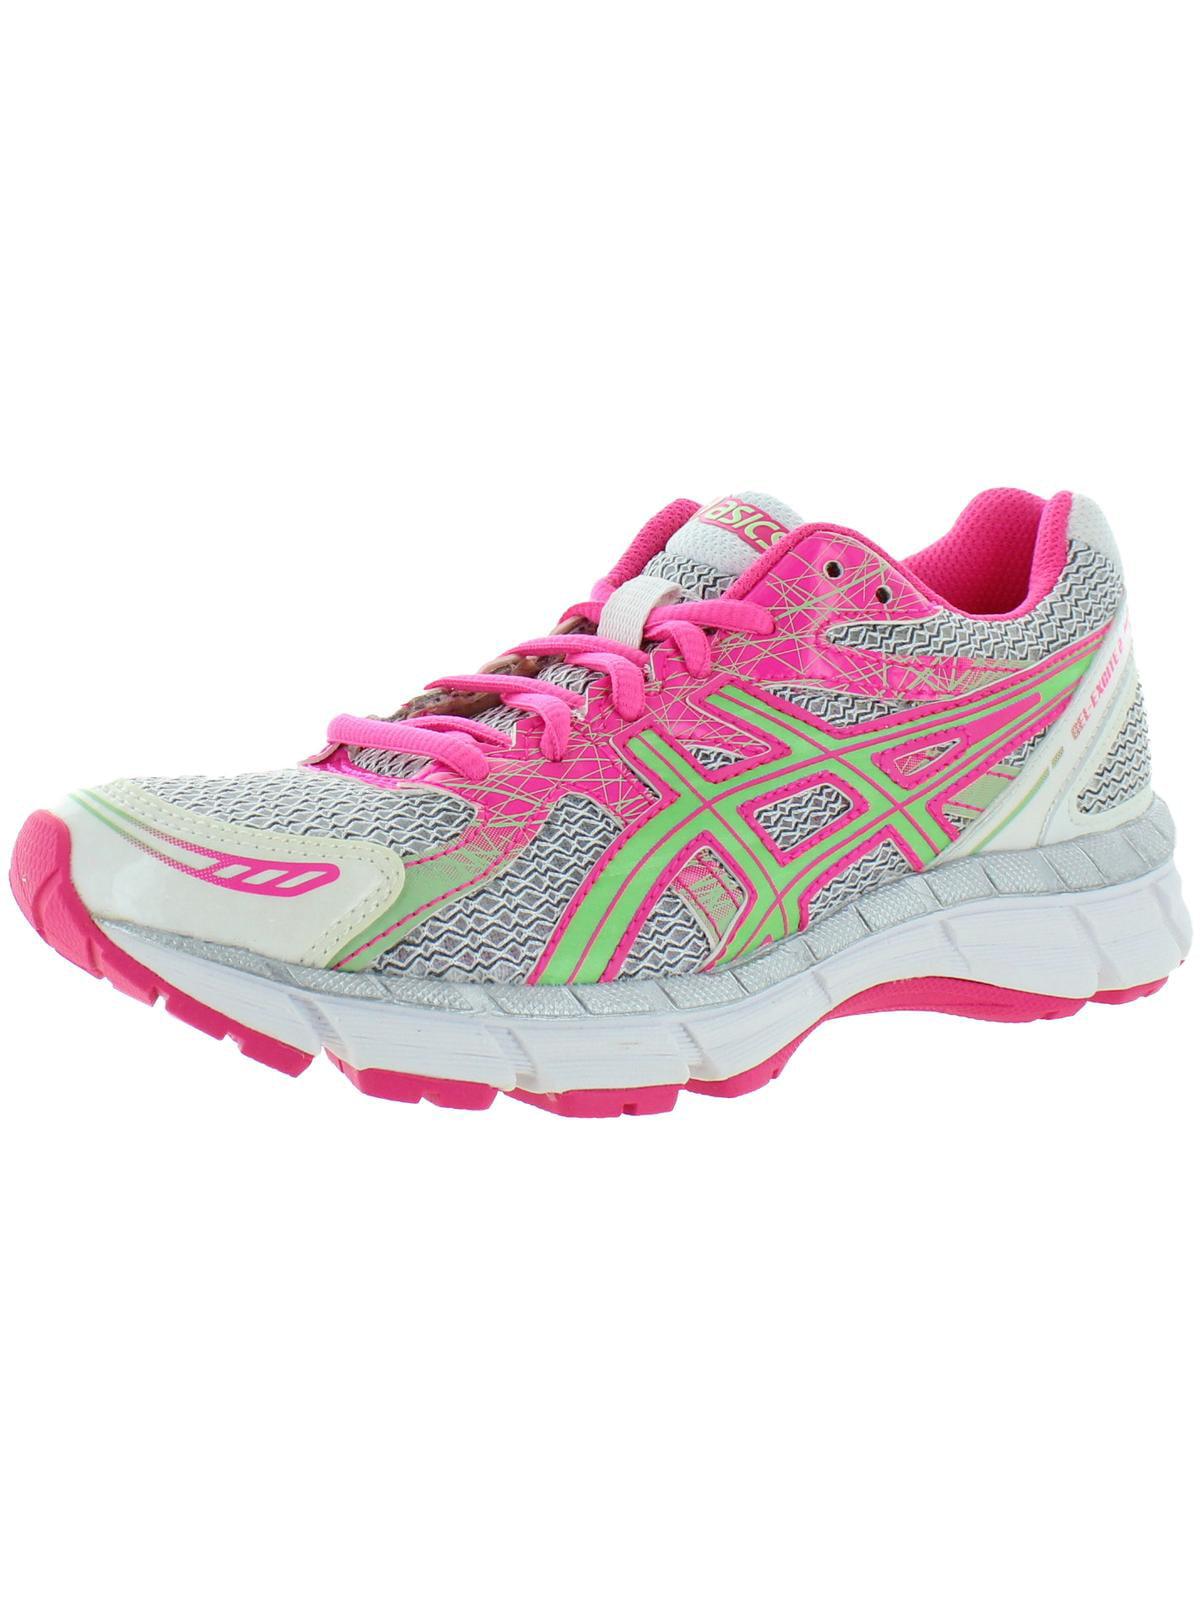 Asics Womens Gel-Excite 2 Mesh Running